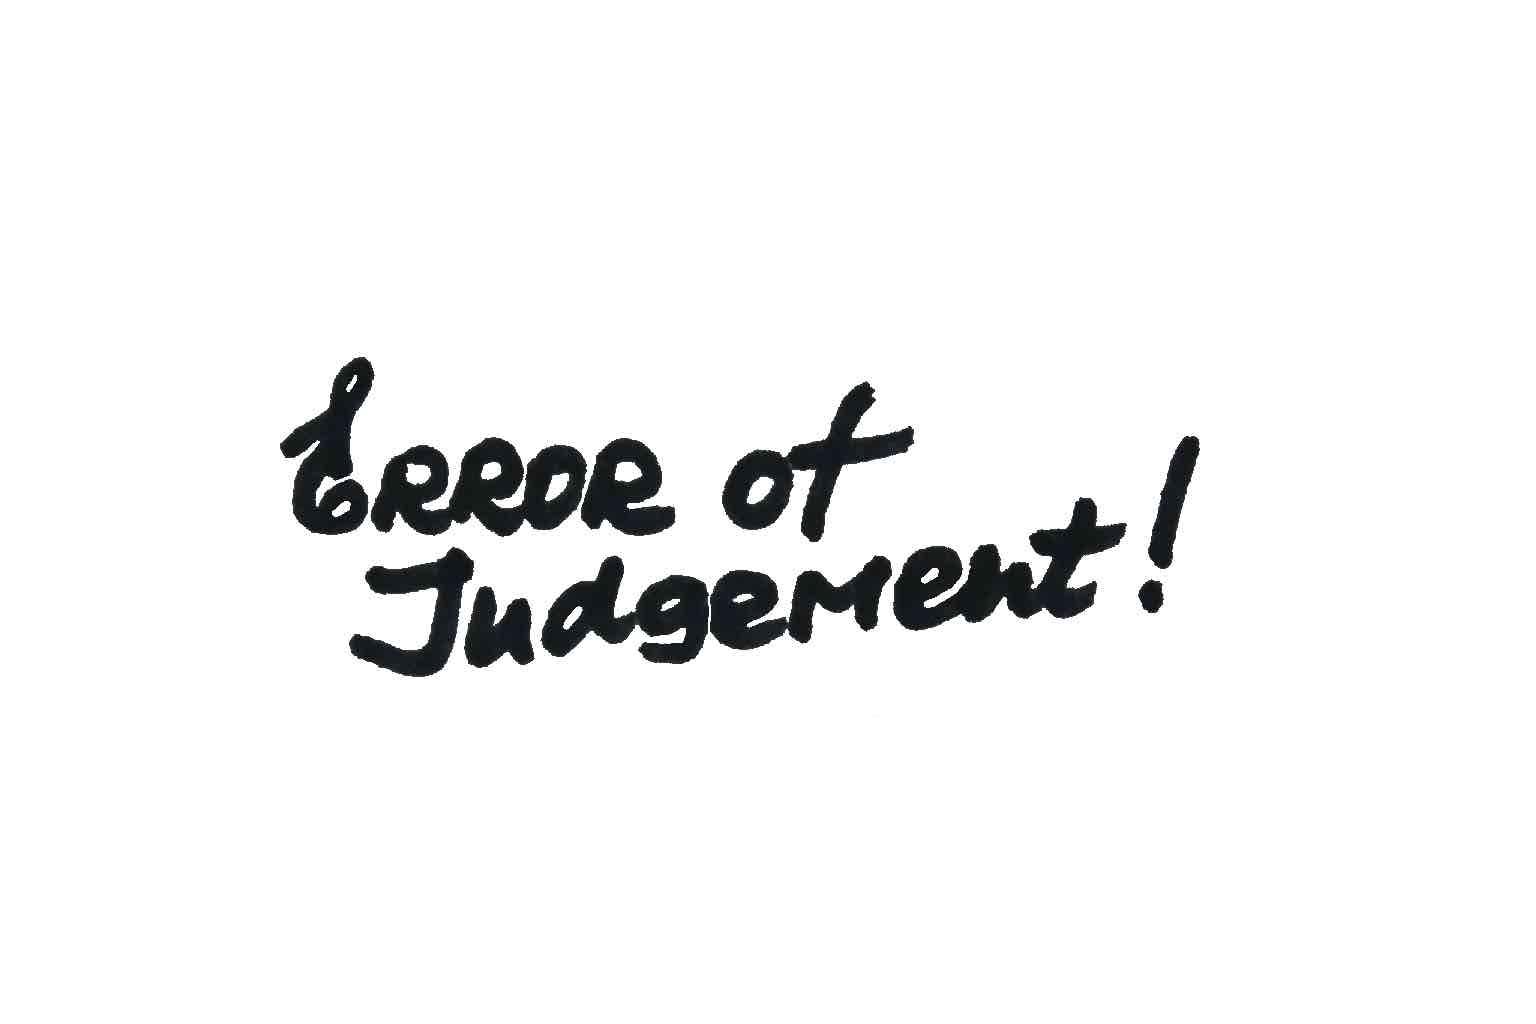 Error of judgment! Handwritten message on a white background.